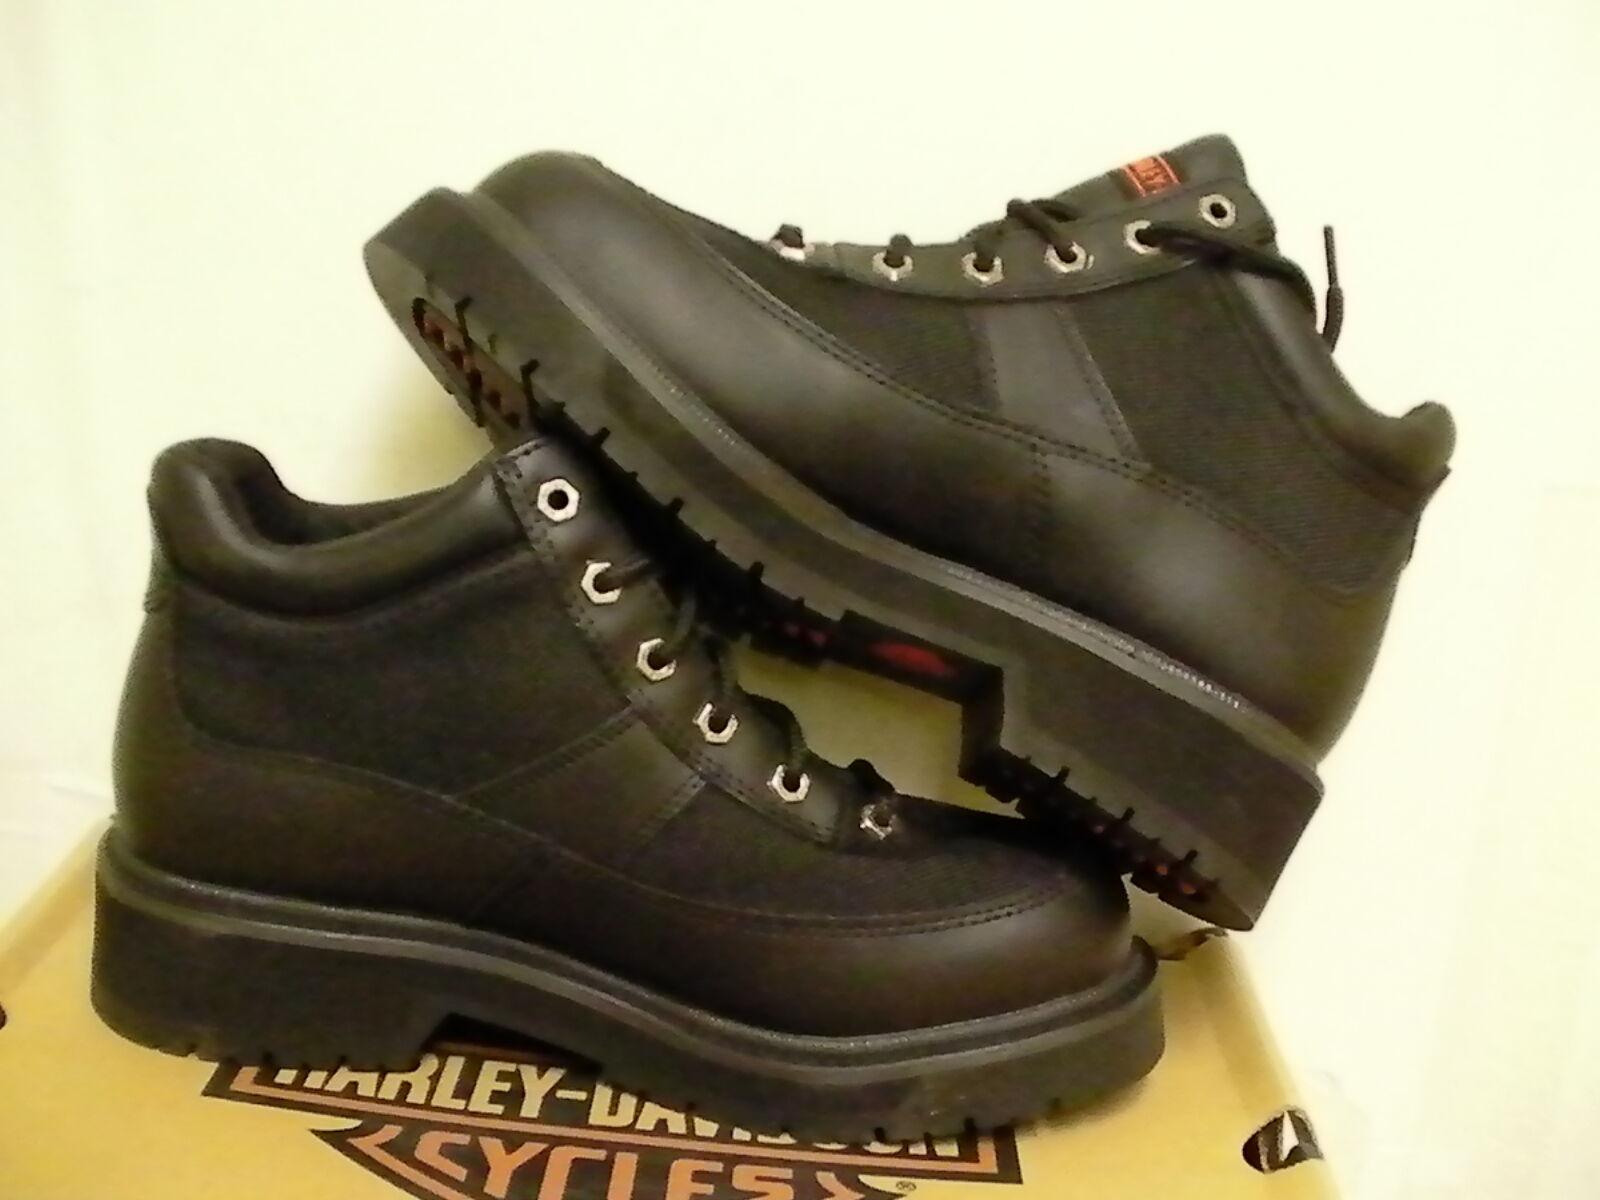 Harley davidson casual Stiefel sierra 5 inch high high high leather Stiefel schwarz Größe 8 us 0696b9